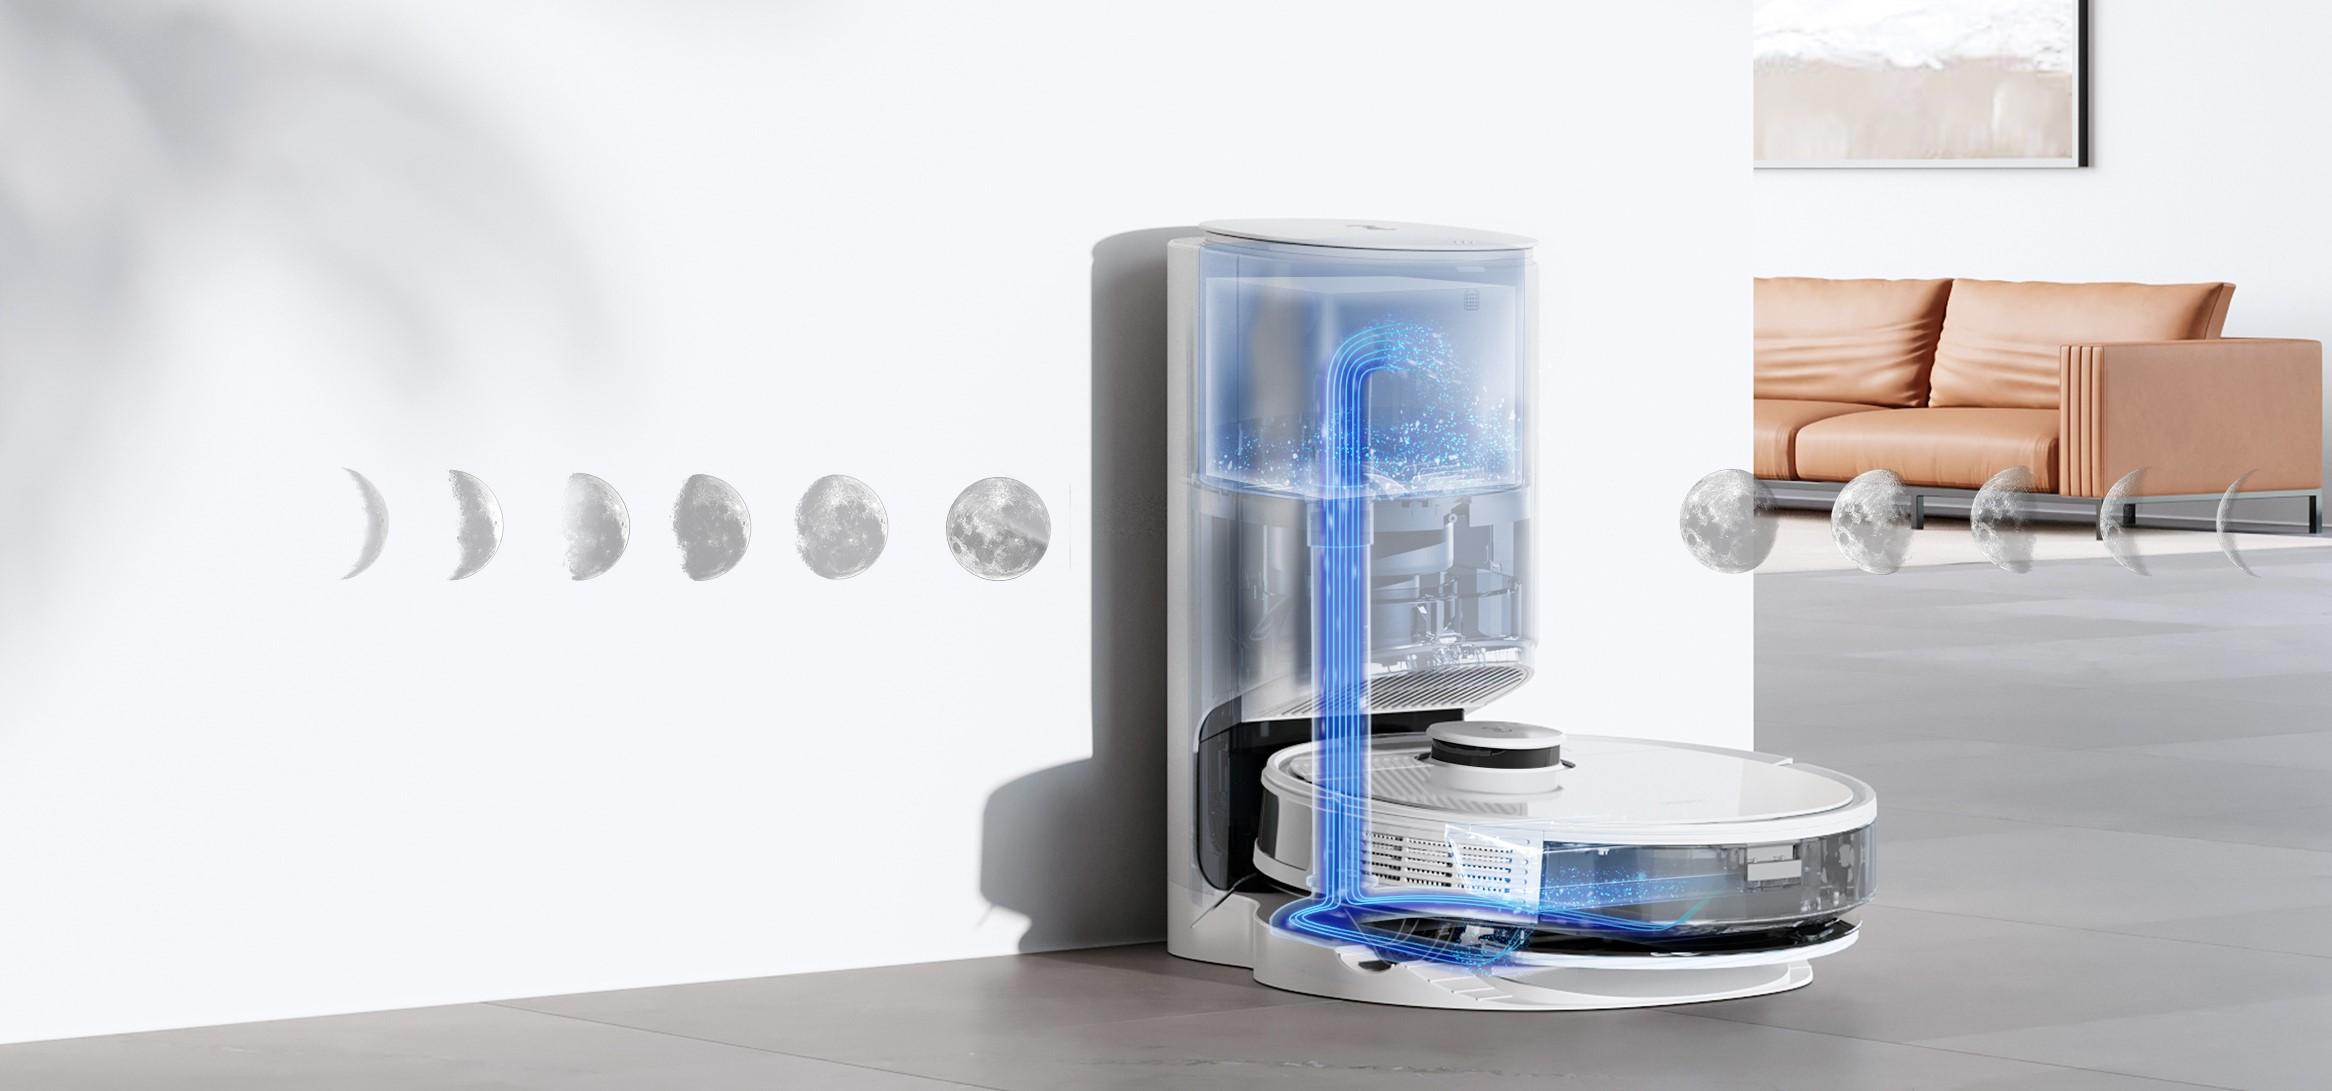 Ecovacs Deebot N8+ : Pulizia completa ed automatica della casa